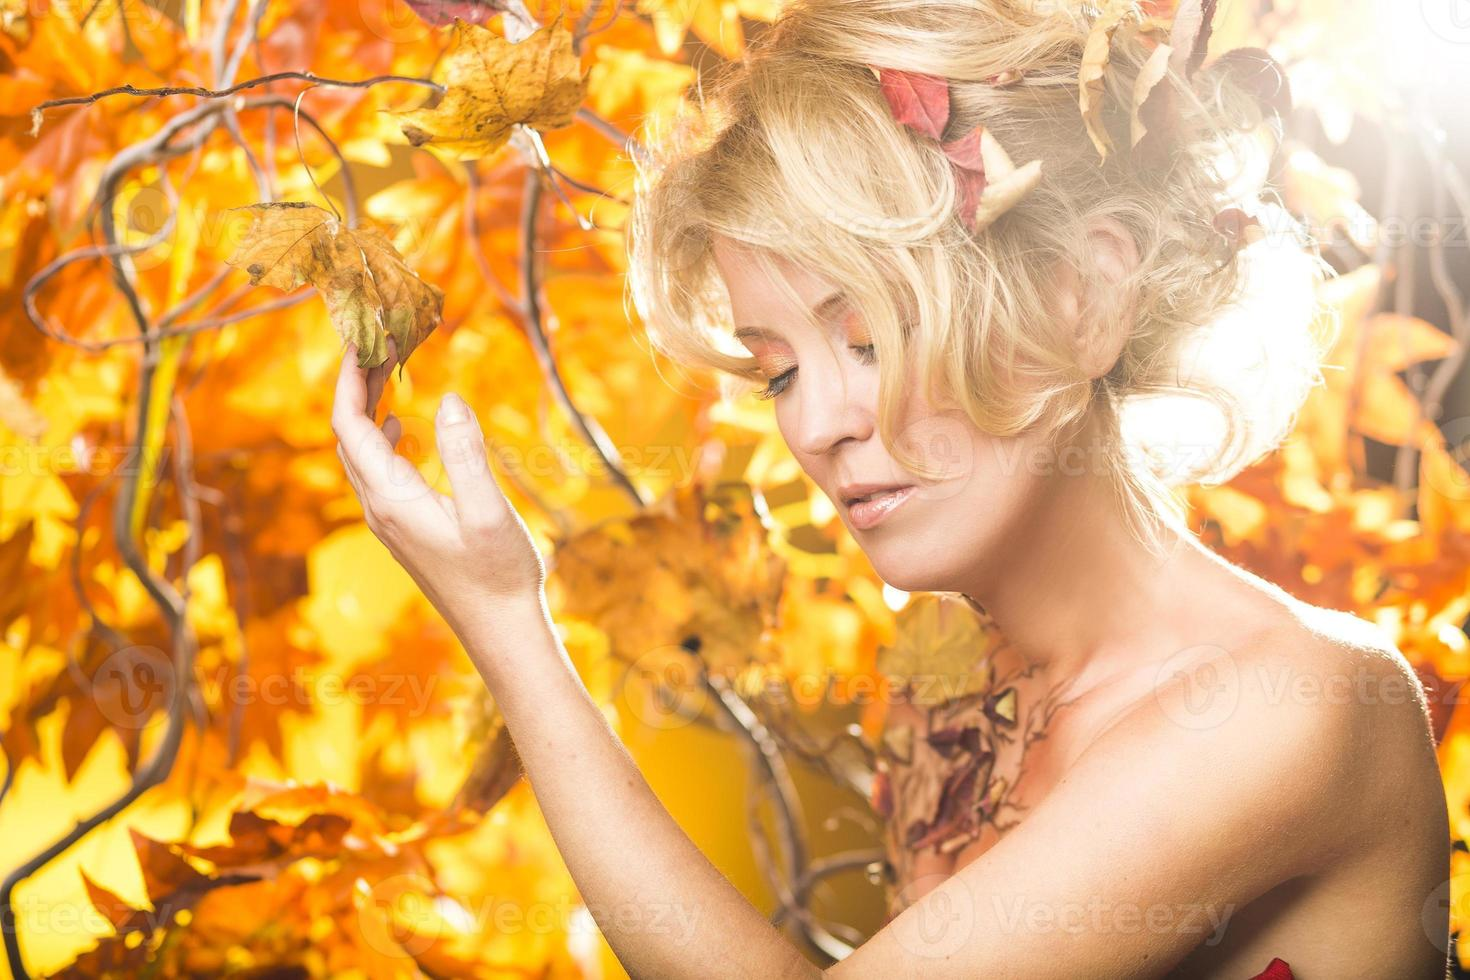 Magic gold autumn blonde girl portrait in leafs photo